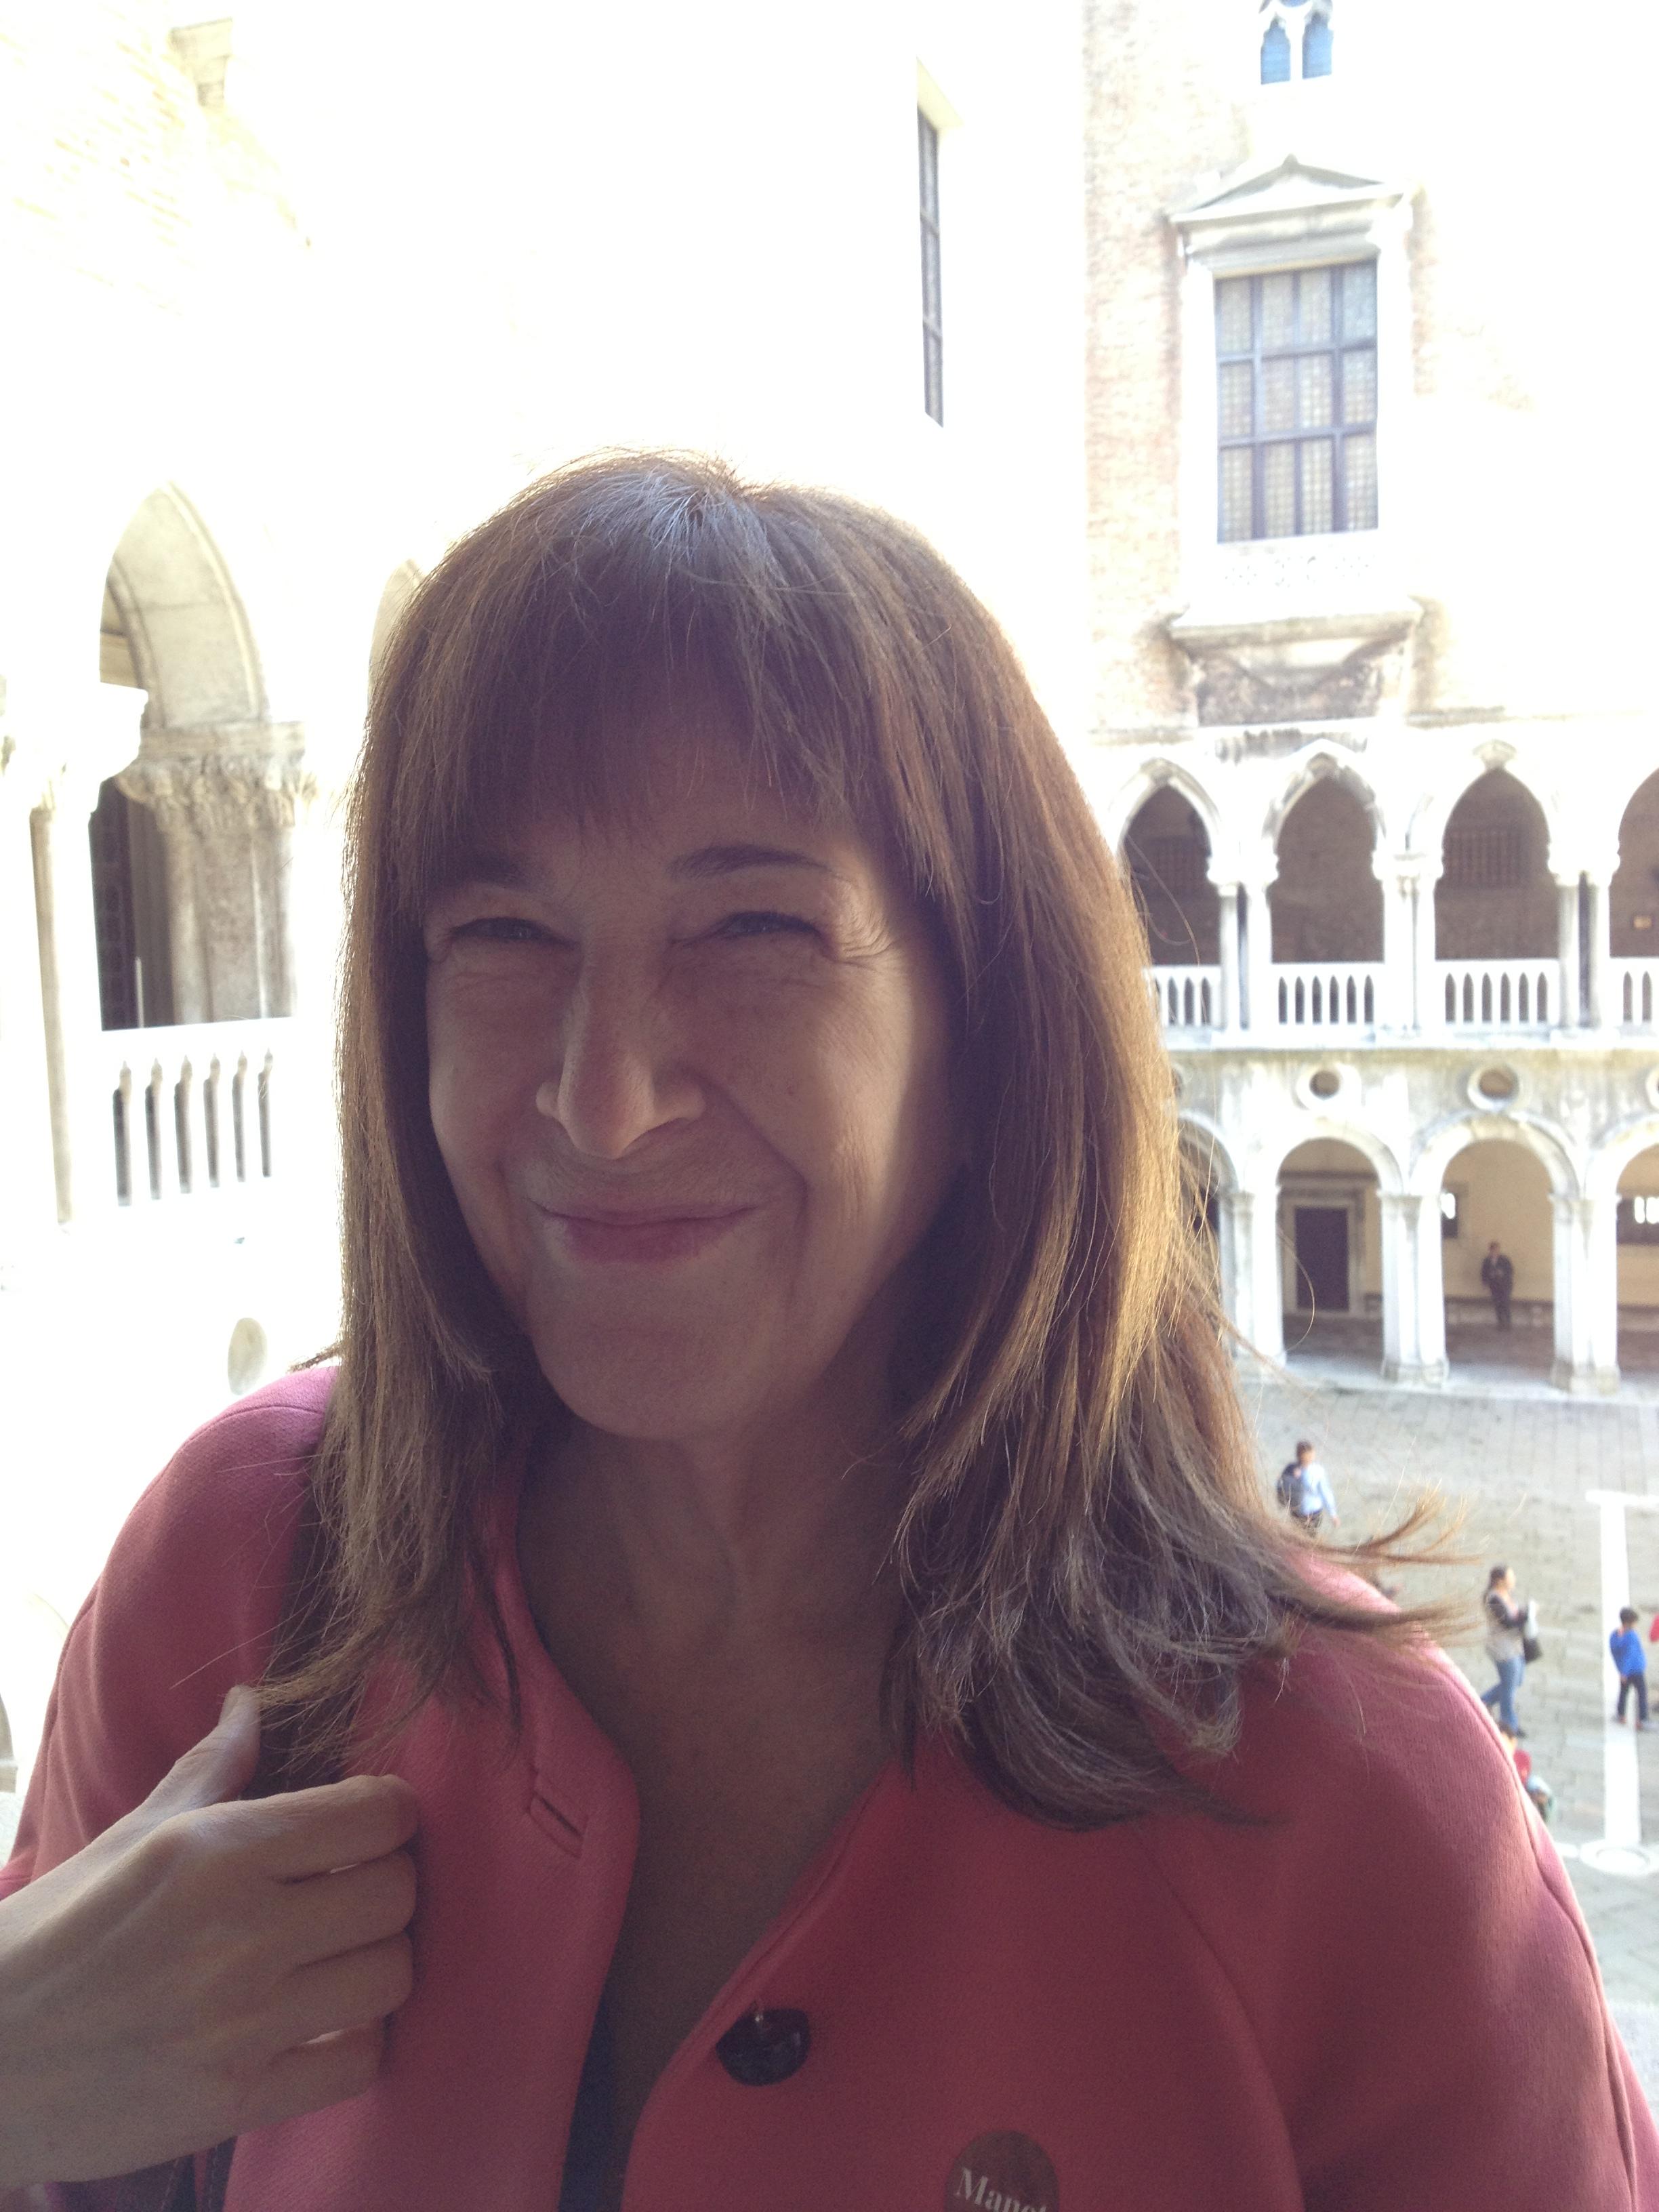 Sylvie gilbert img 3216